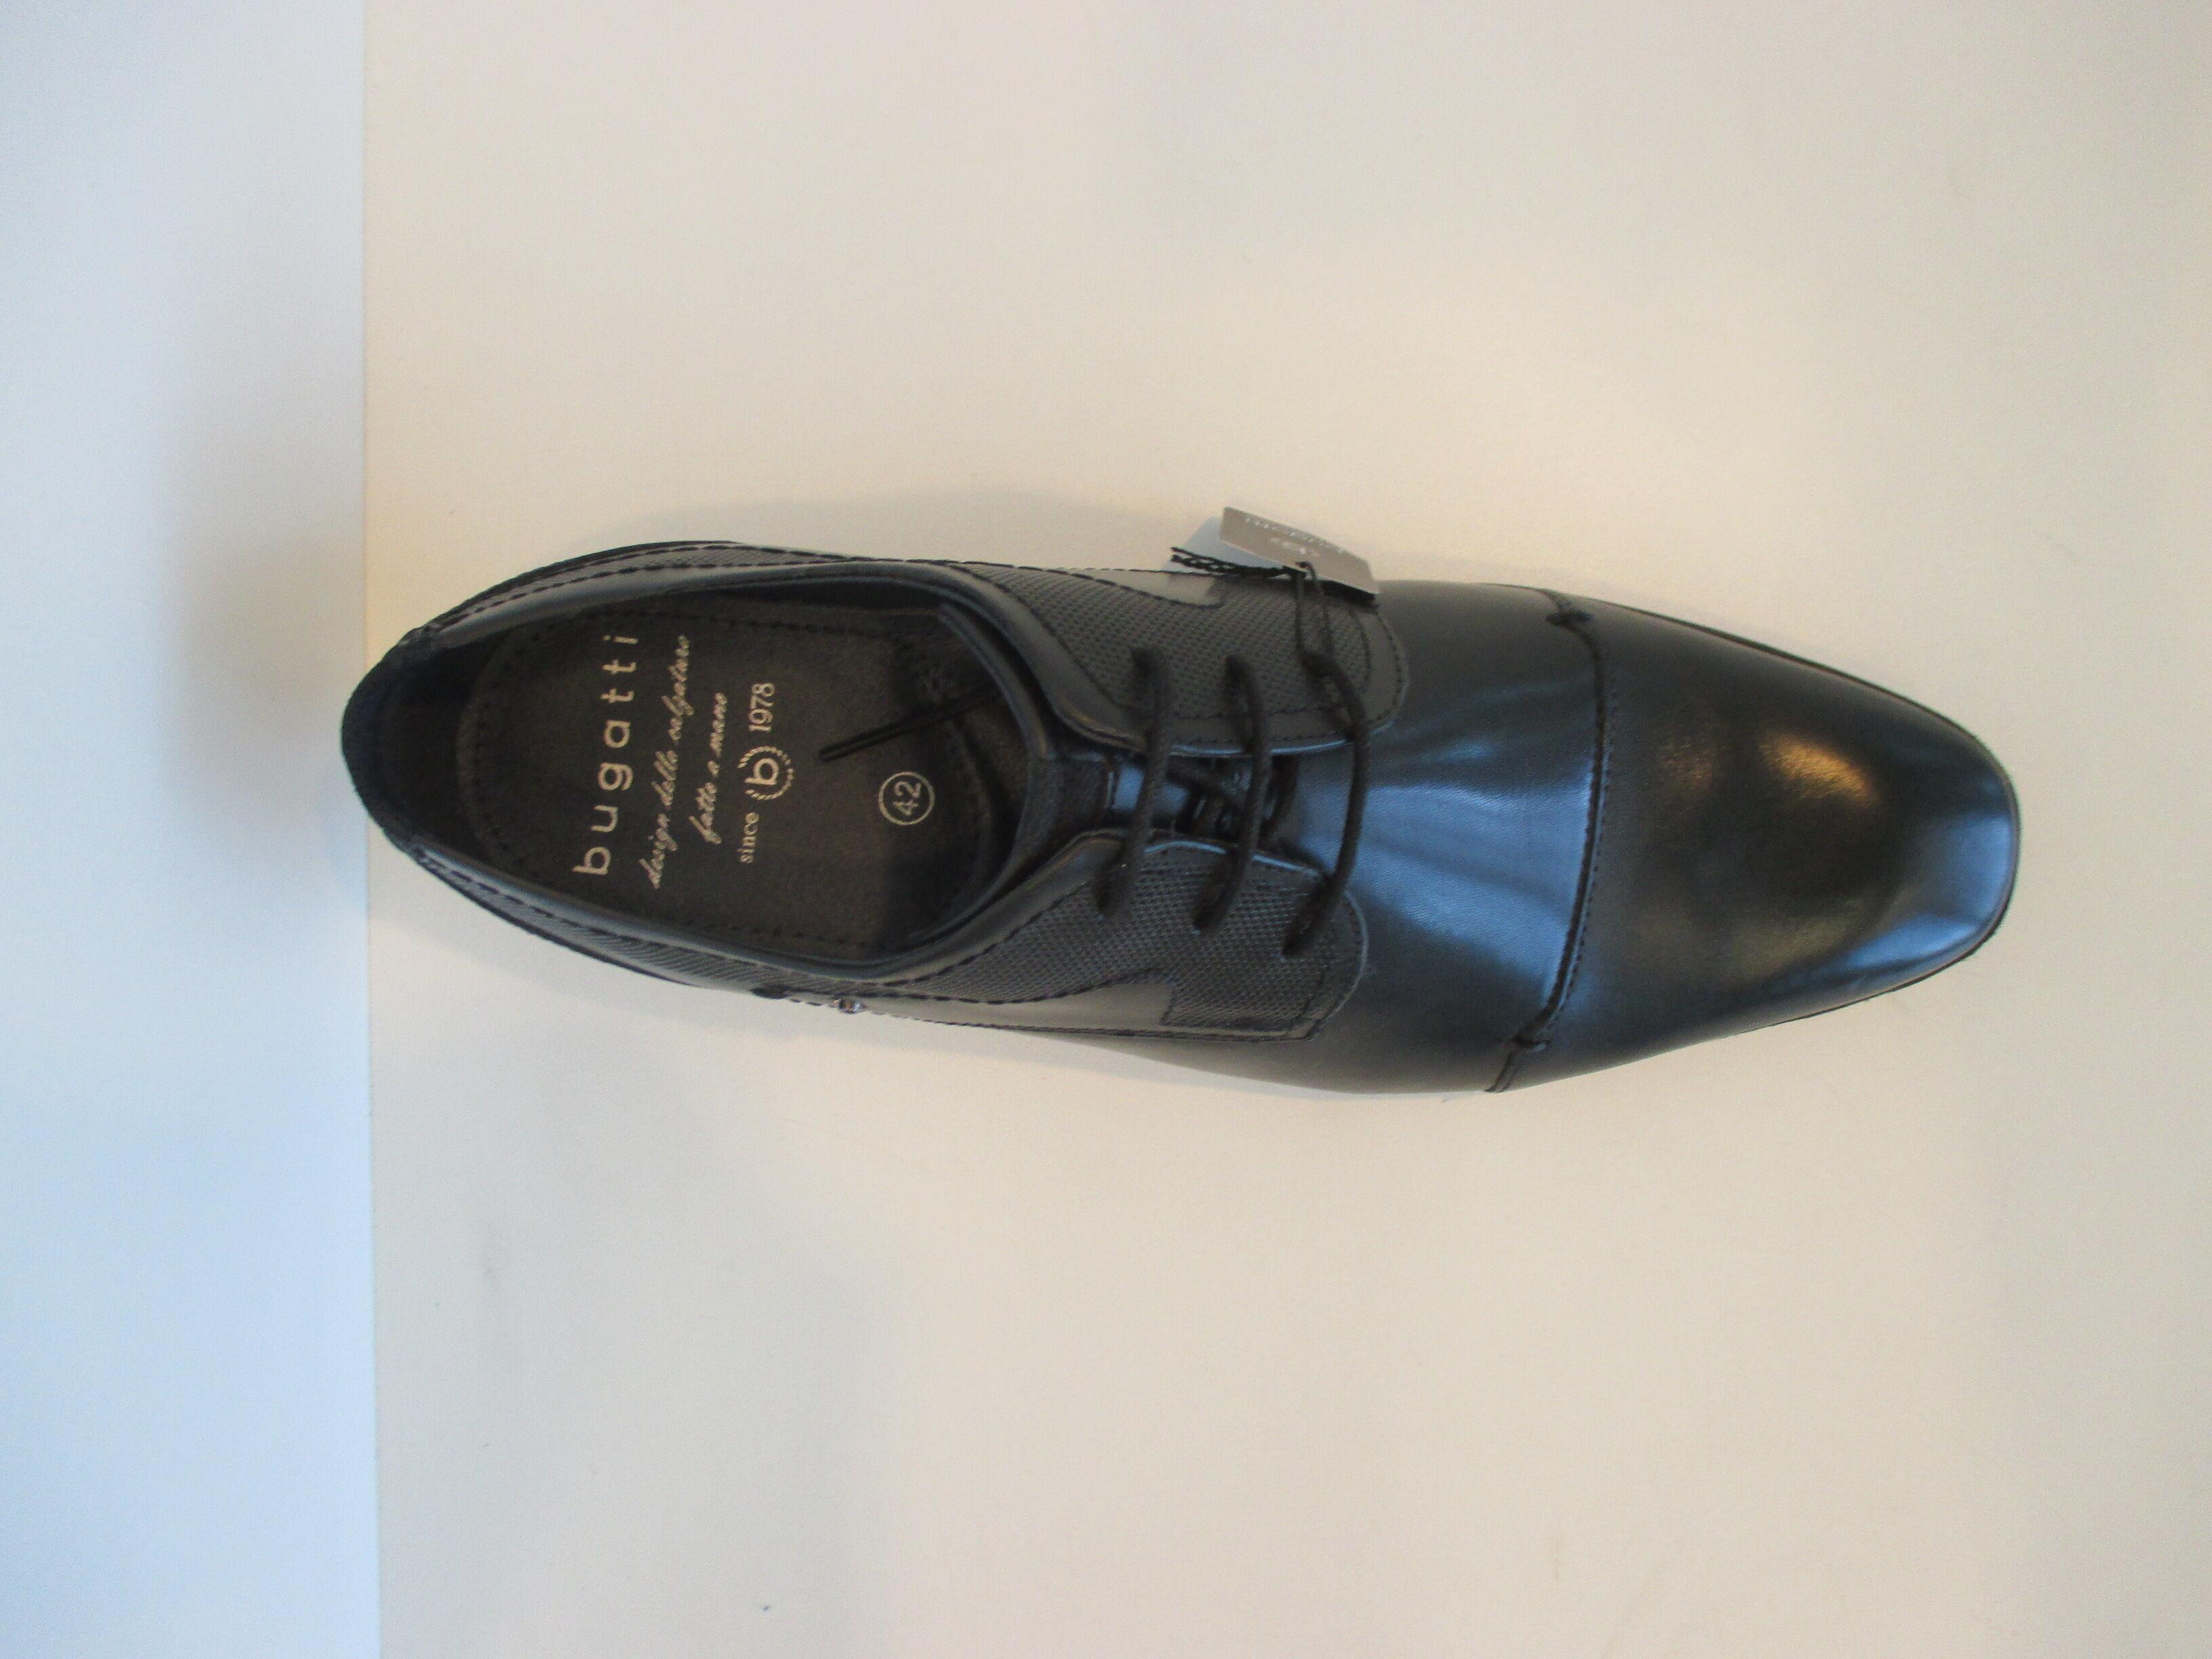 Bild 3 - bugatti shoes man AG Business Schuhe